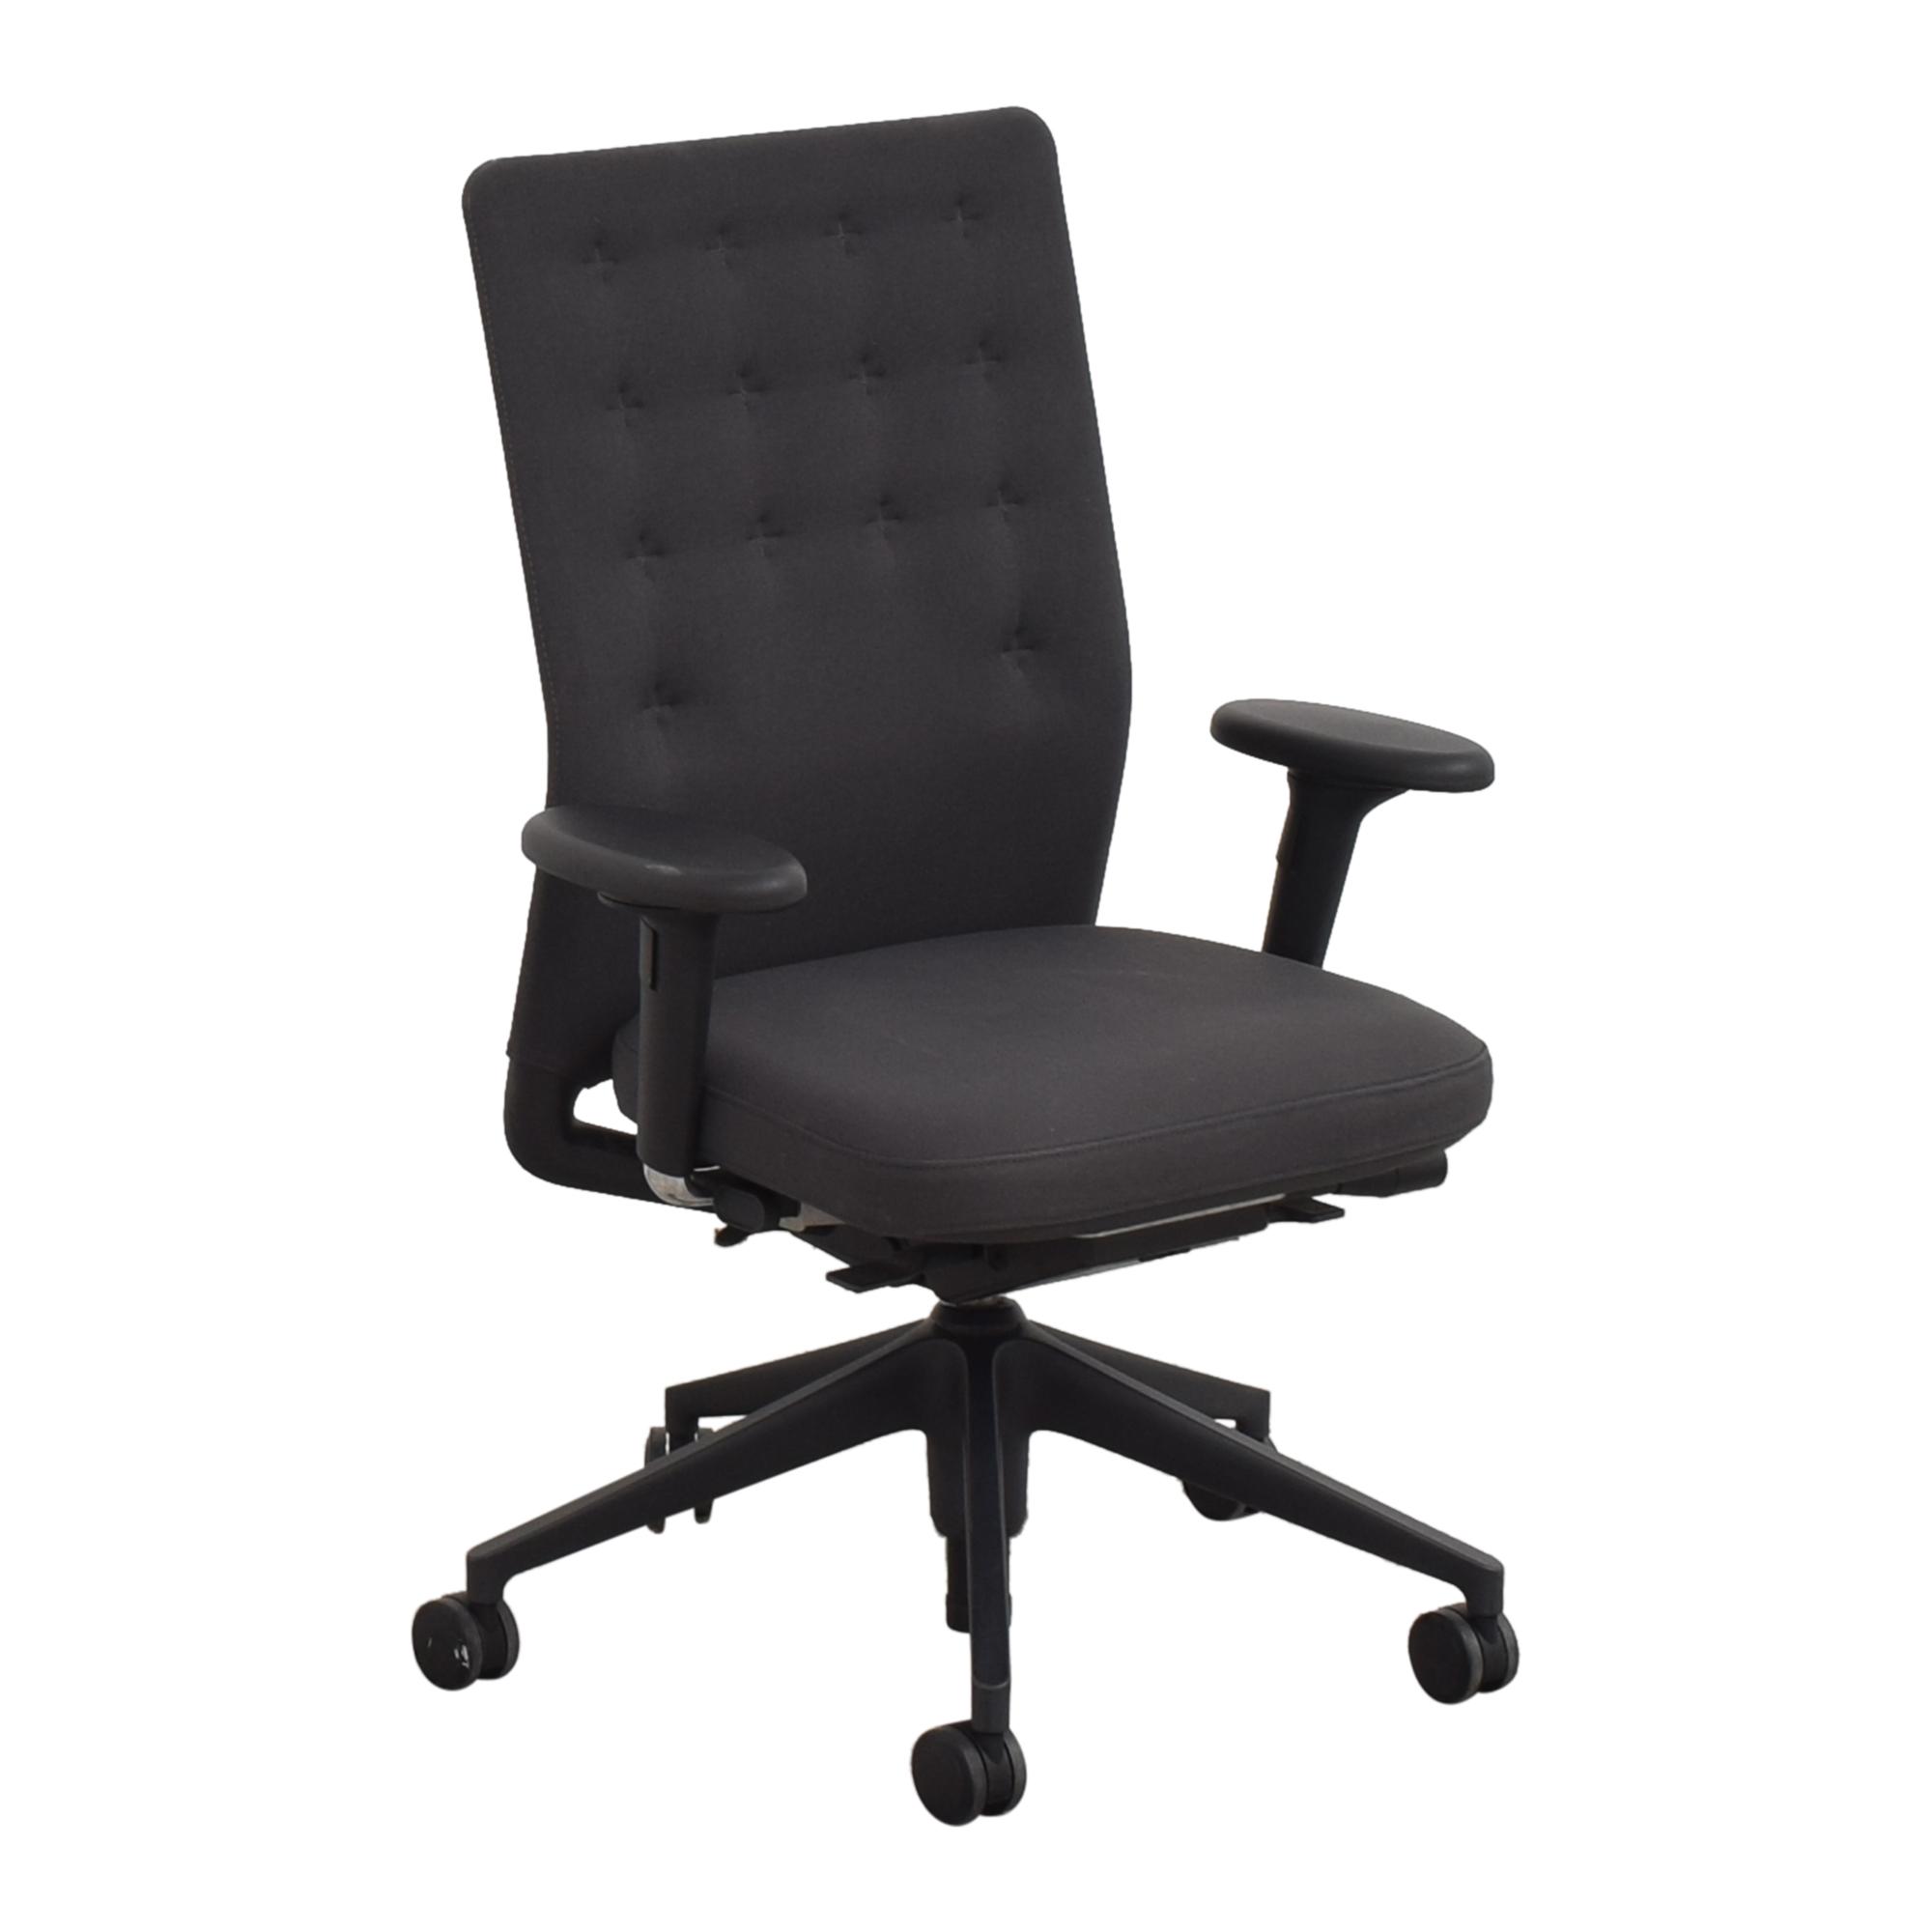 buy Vitra Vitra ID Trim Office Chair online